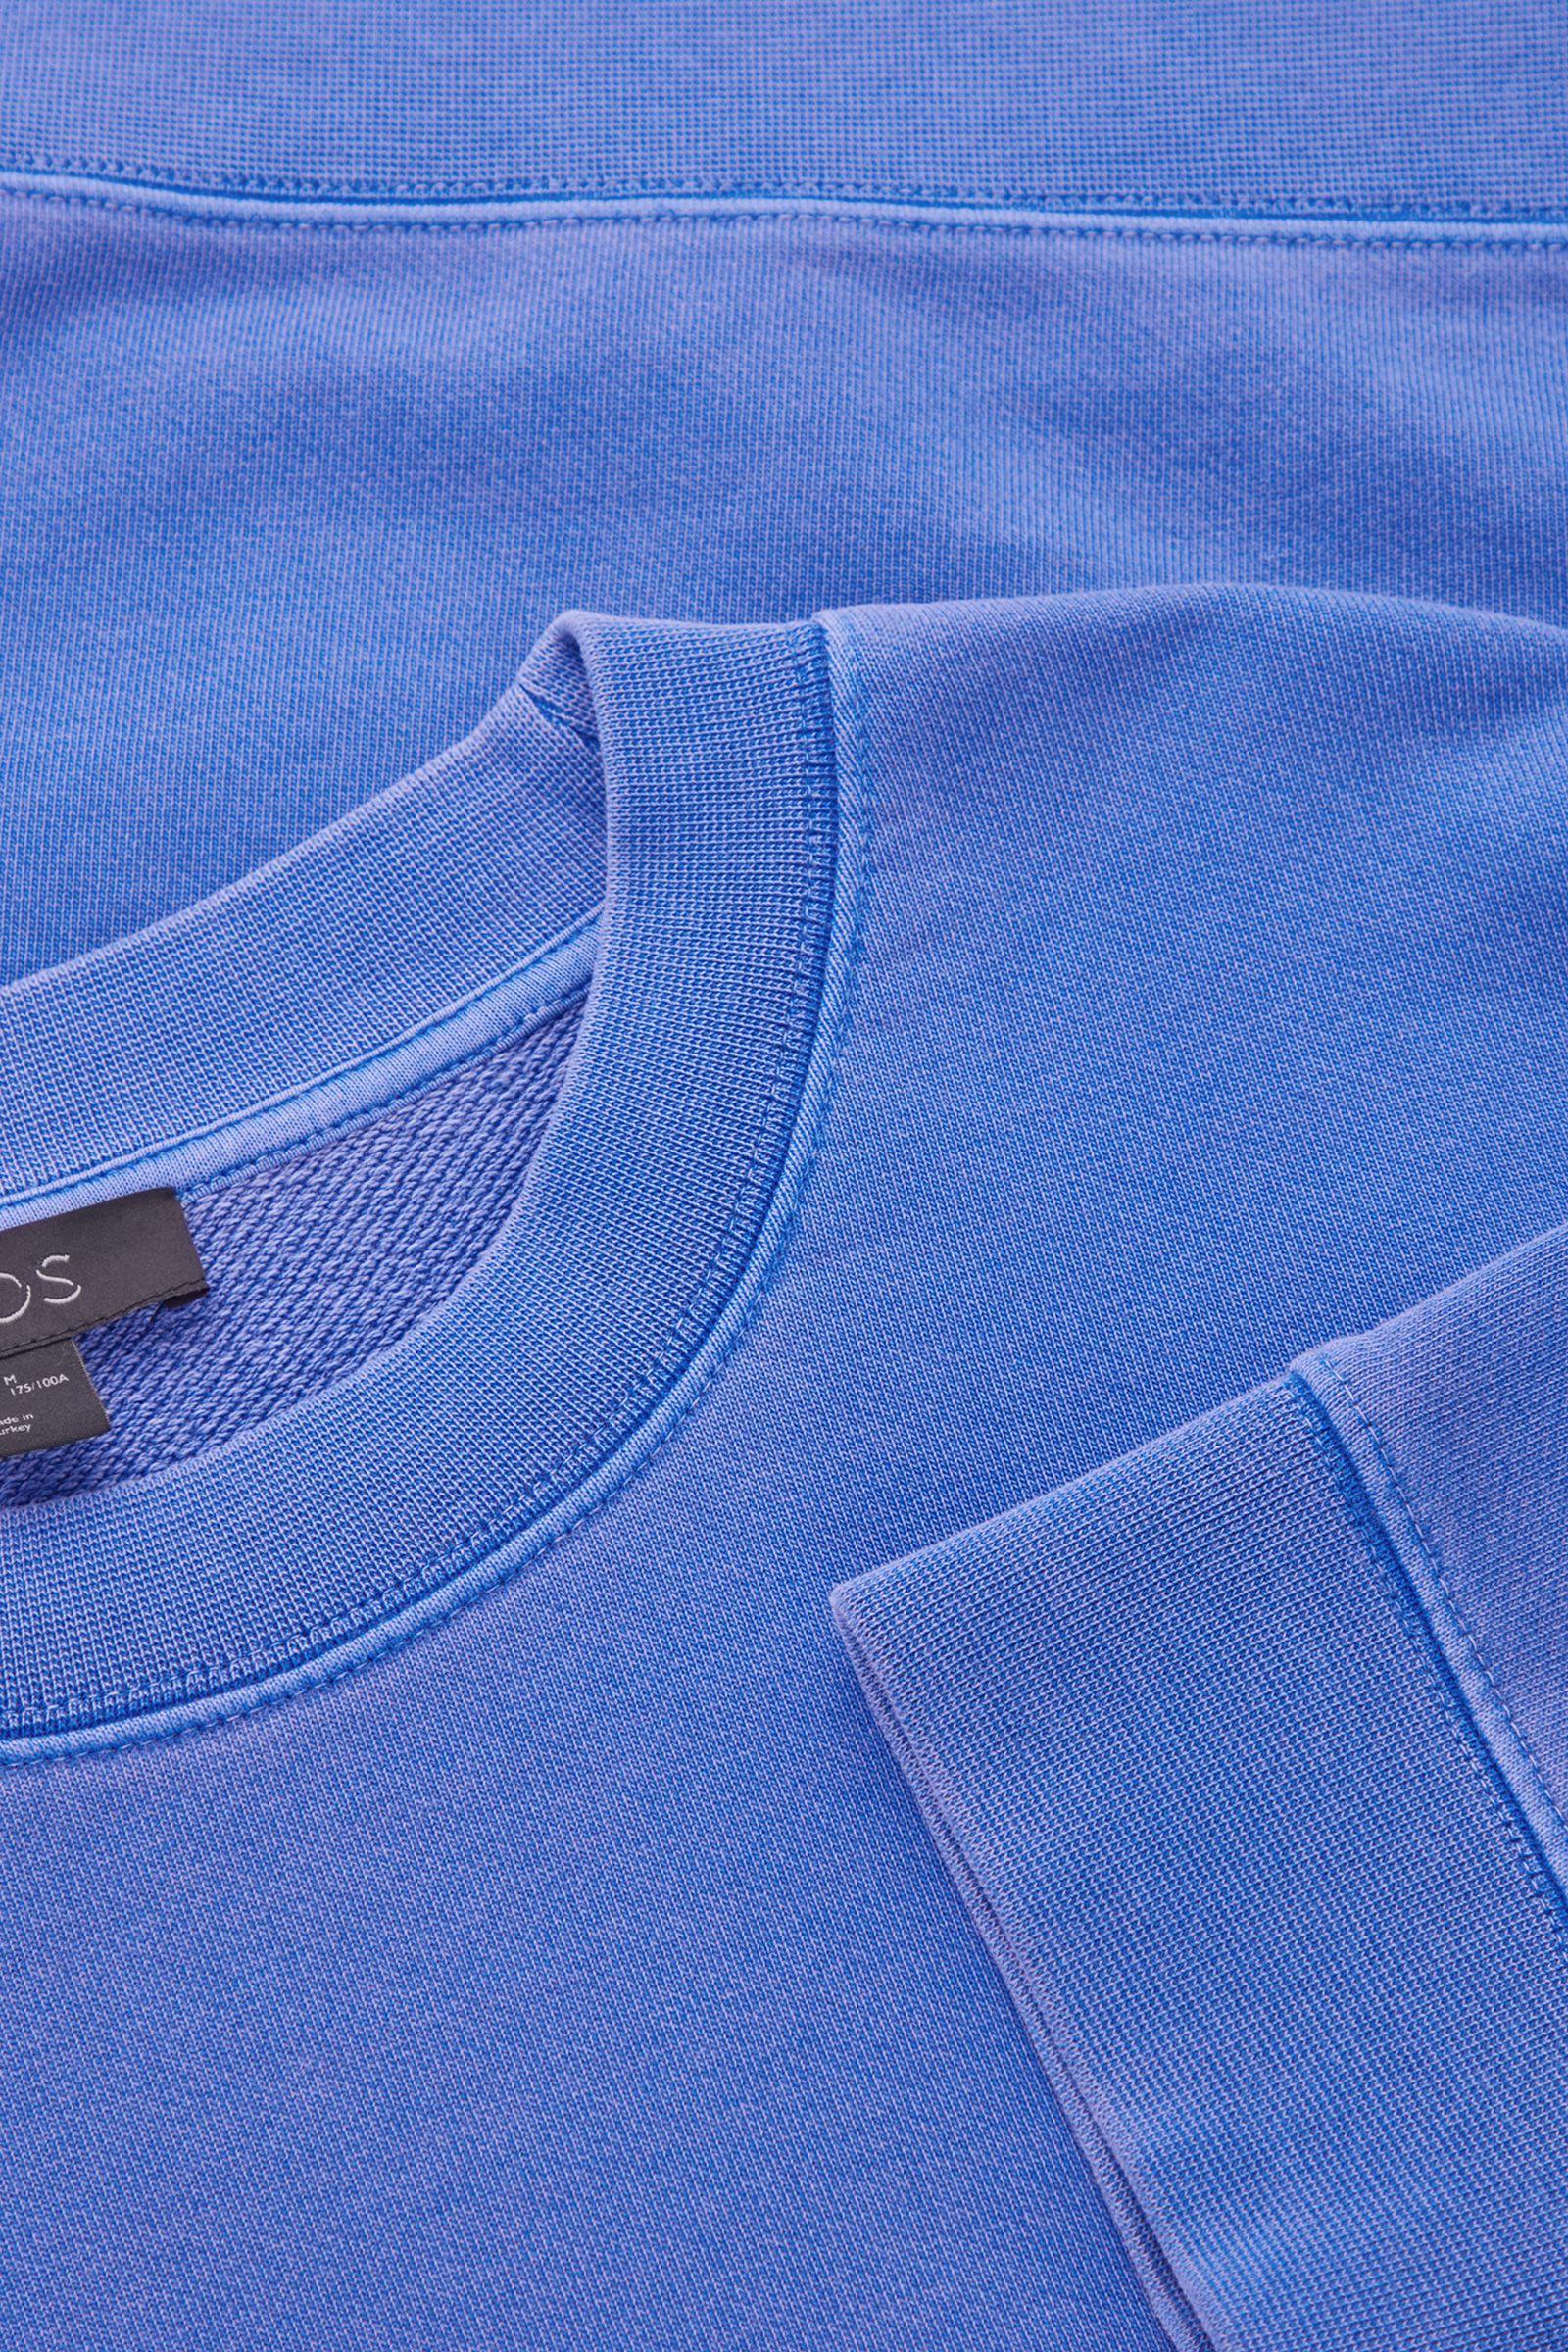 COS 테리 코튼 스웻셔츠의 블루컬러 Detail입니다.